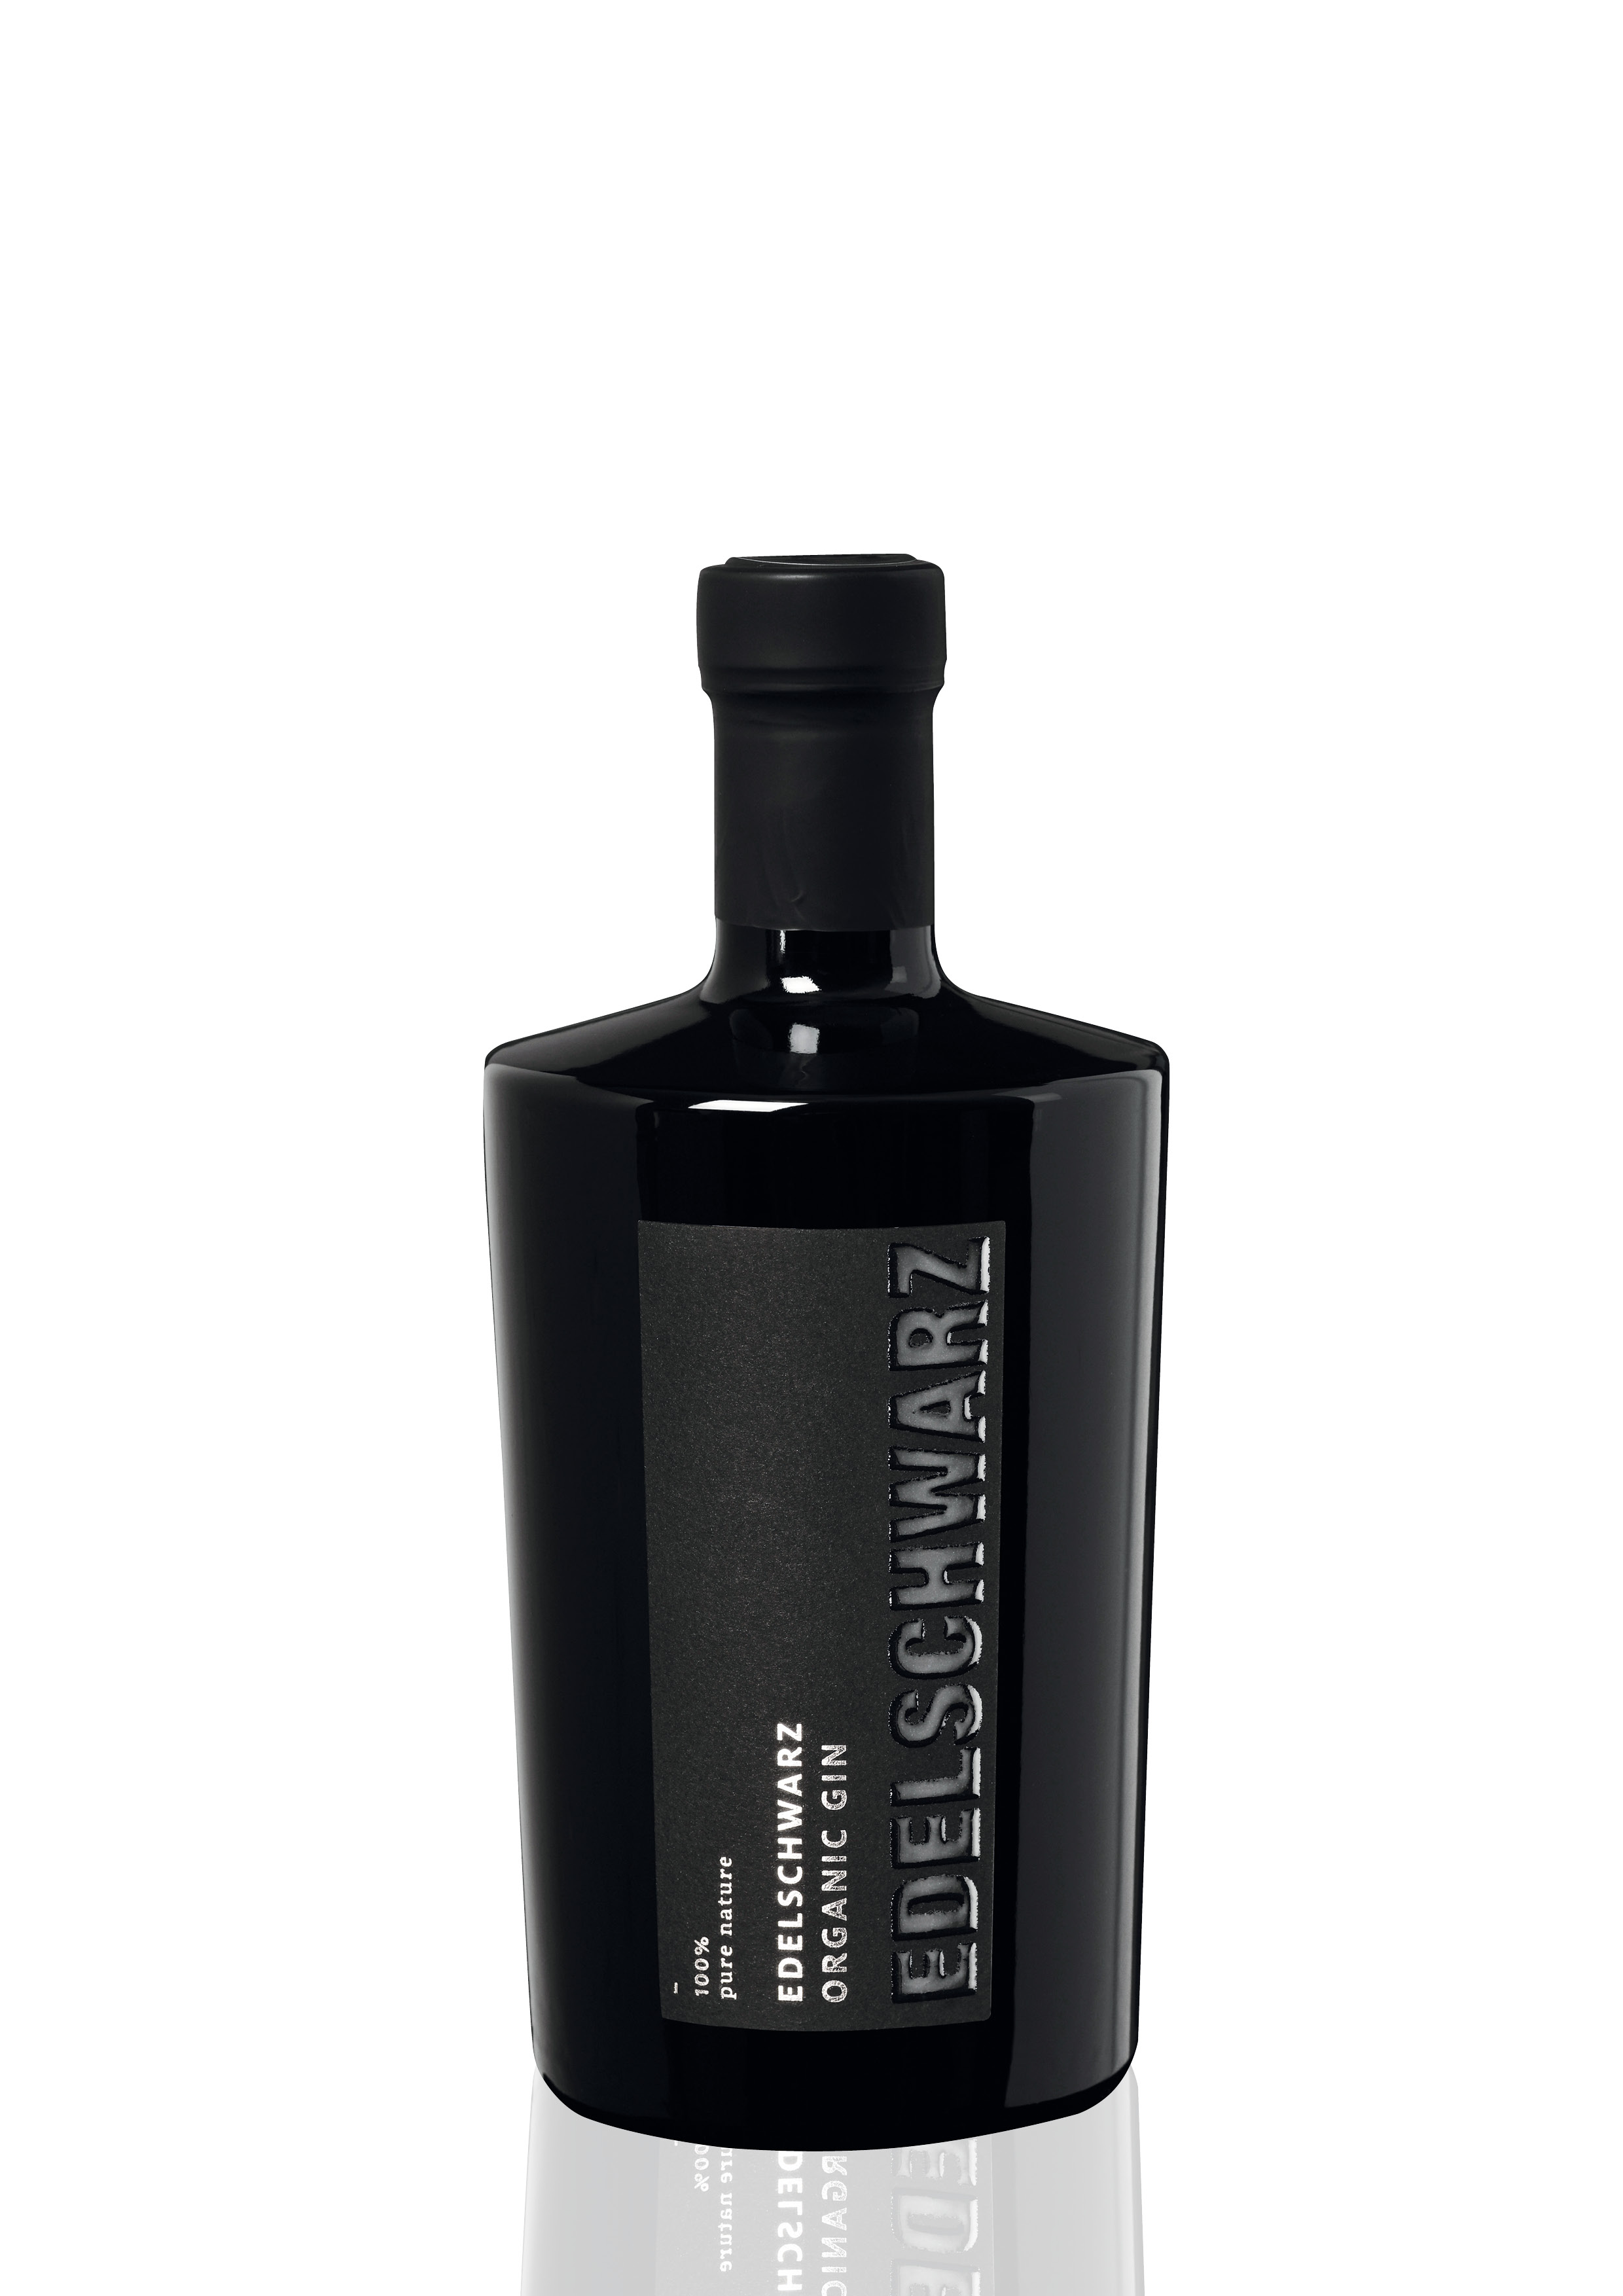 Edelschwarz Organic Gin